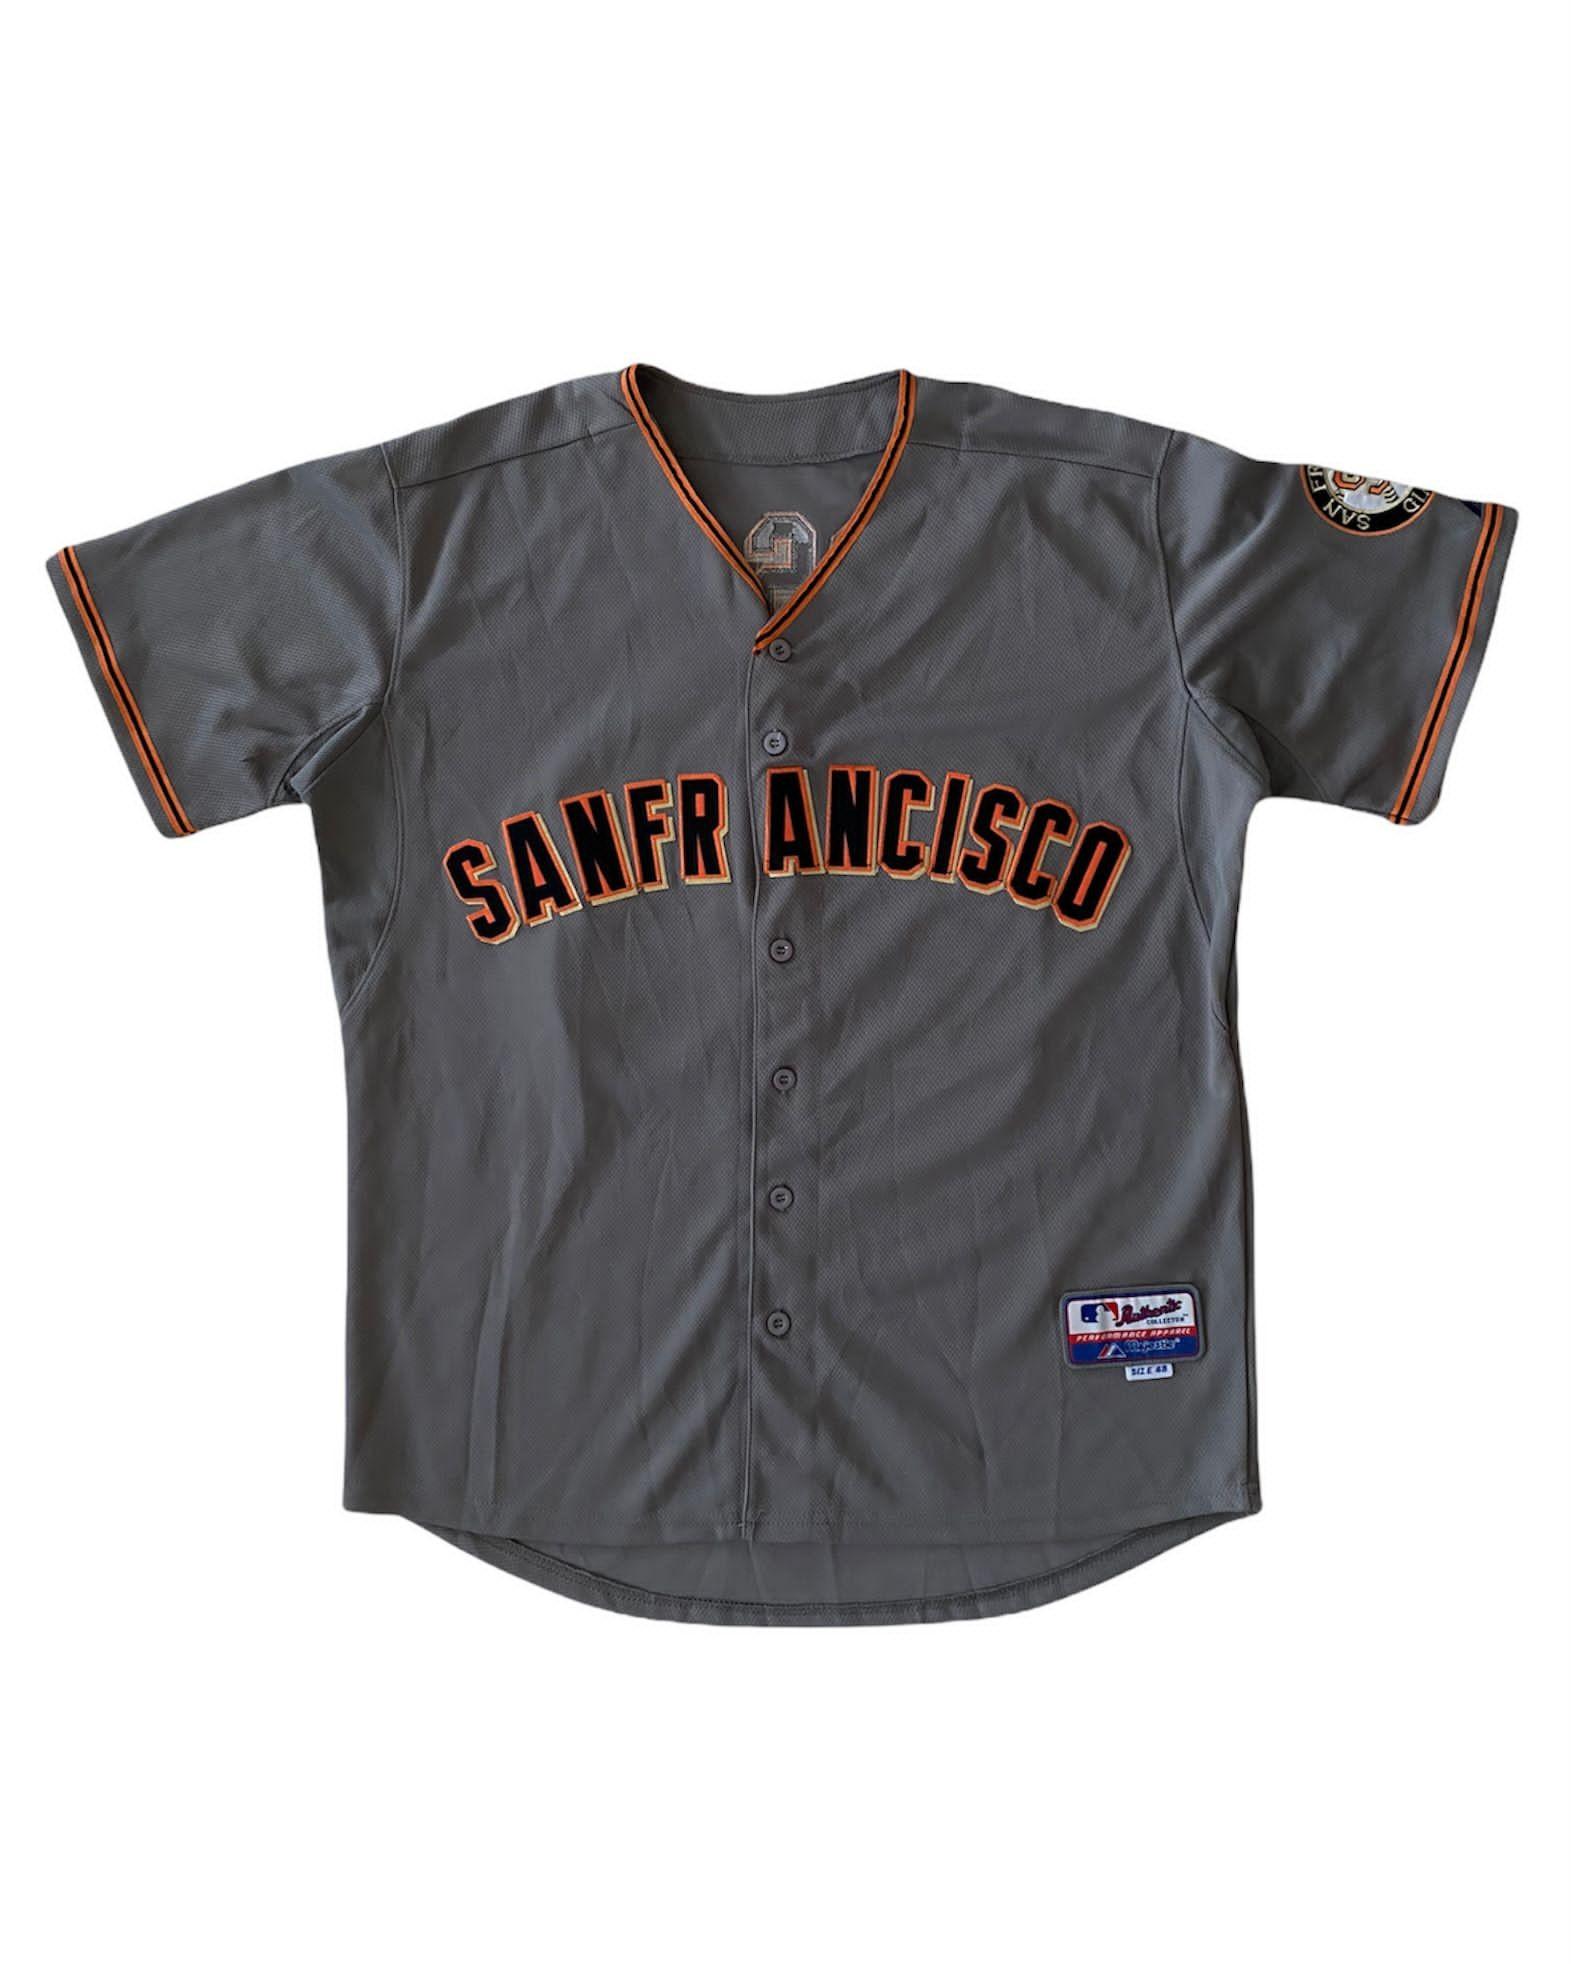 Majestic MLB Sanfrancisco Jersey Shirt (L)